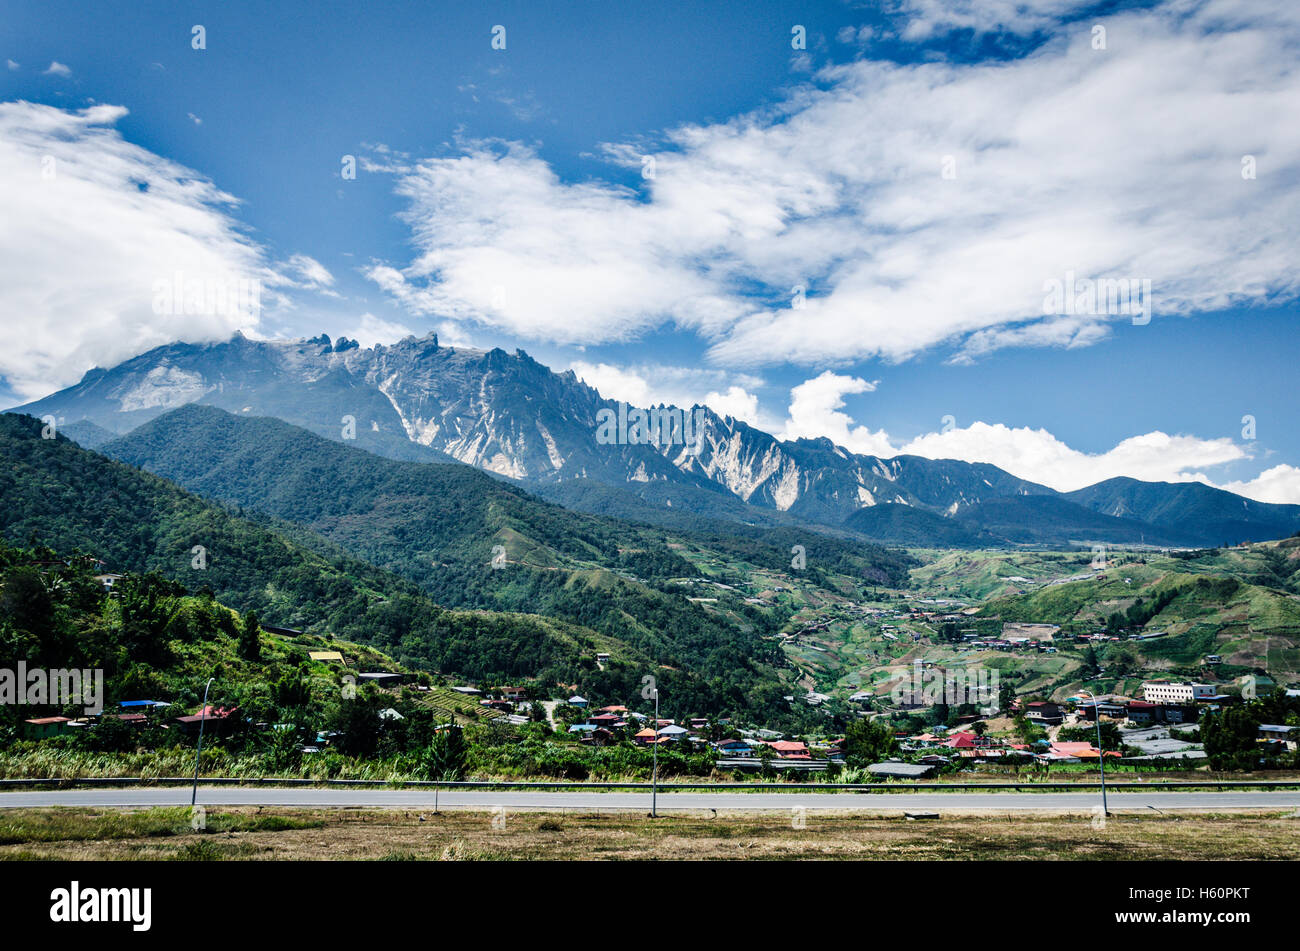 Gunung Kinabalu High Resolution Stock Photography And Images Alamy